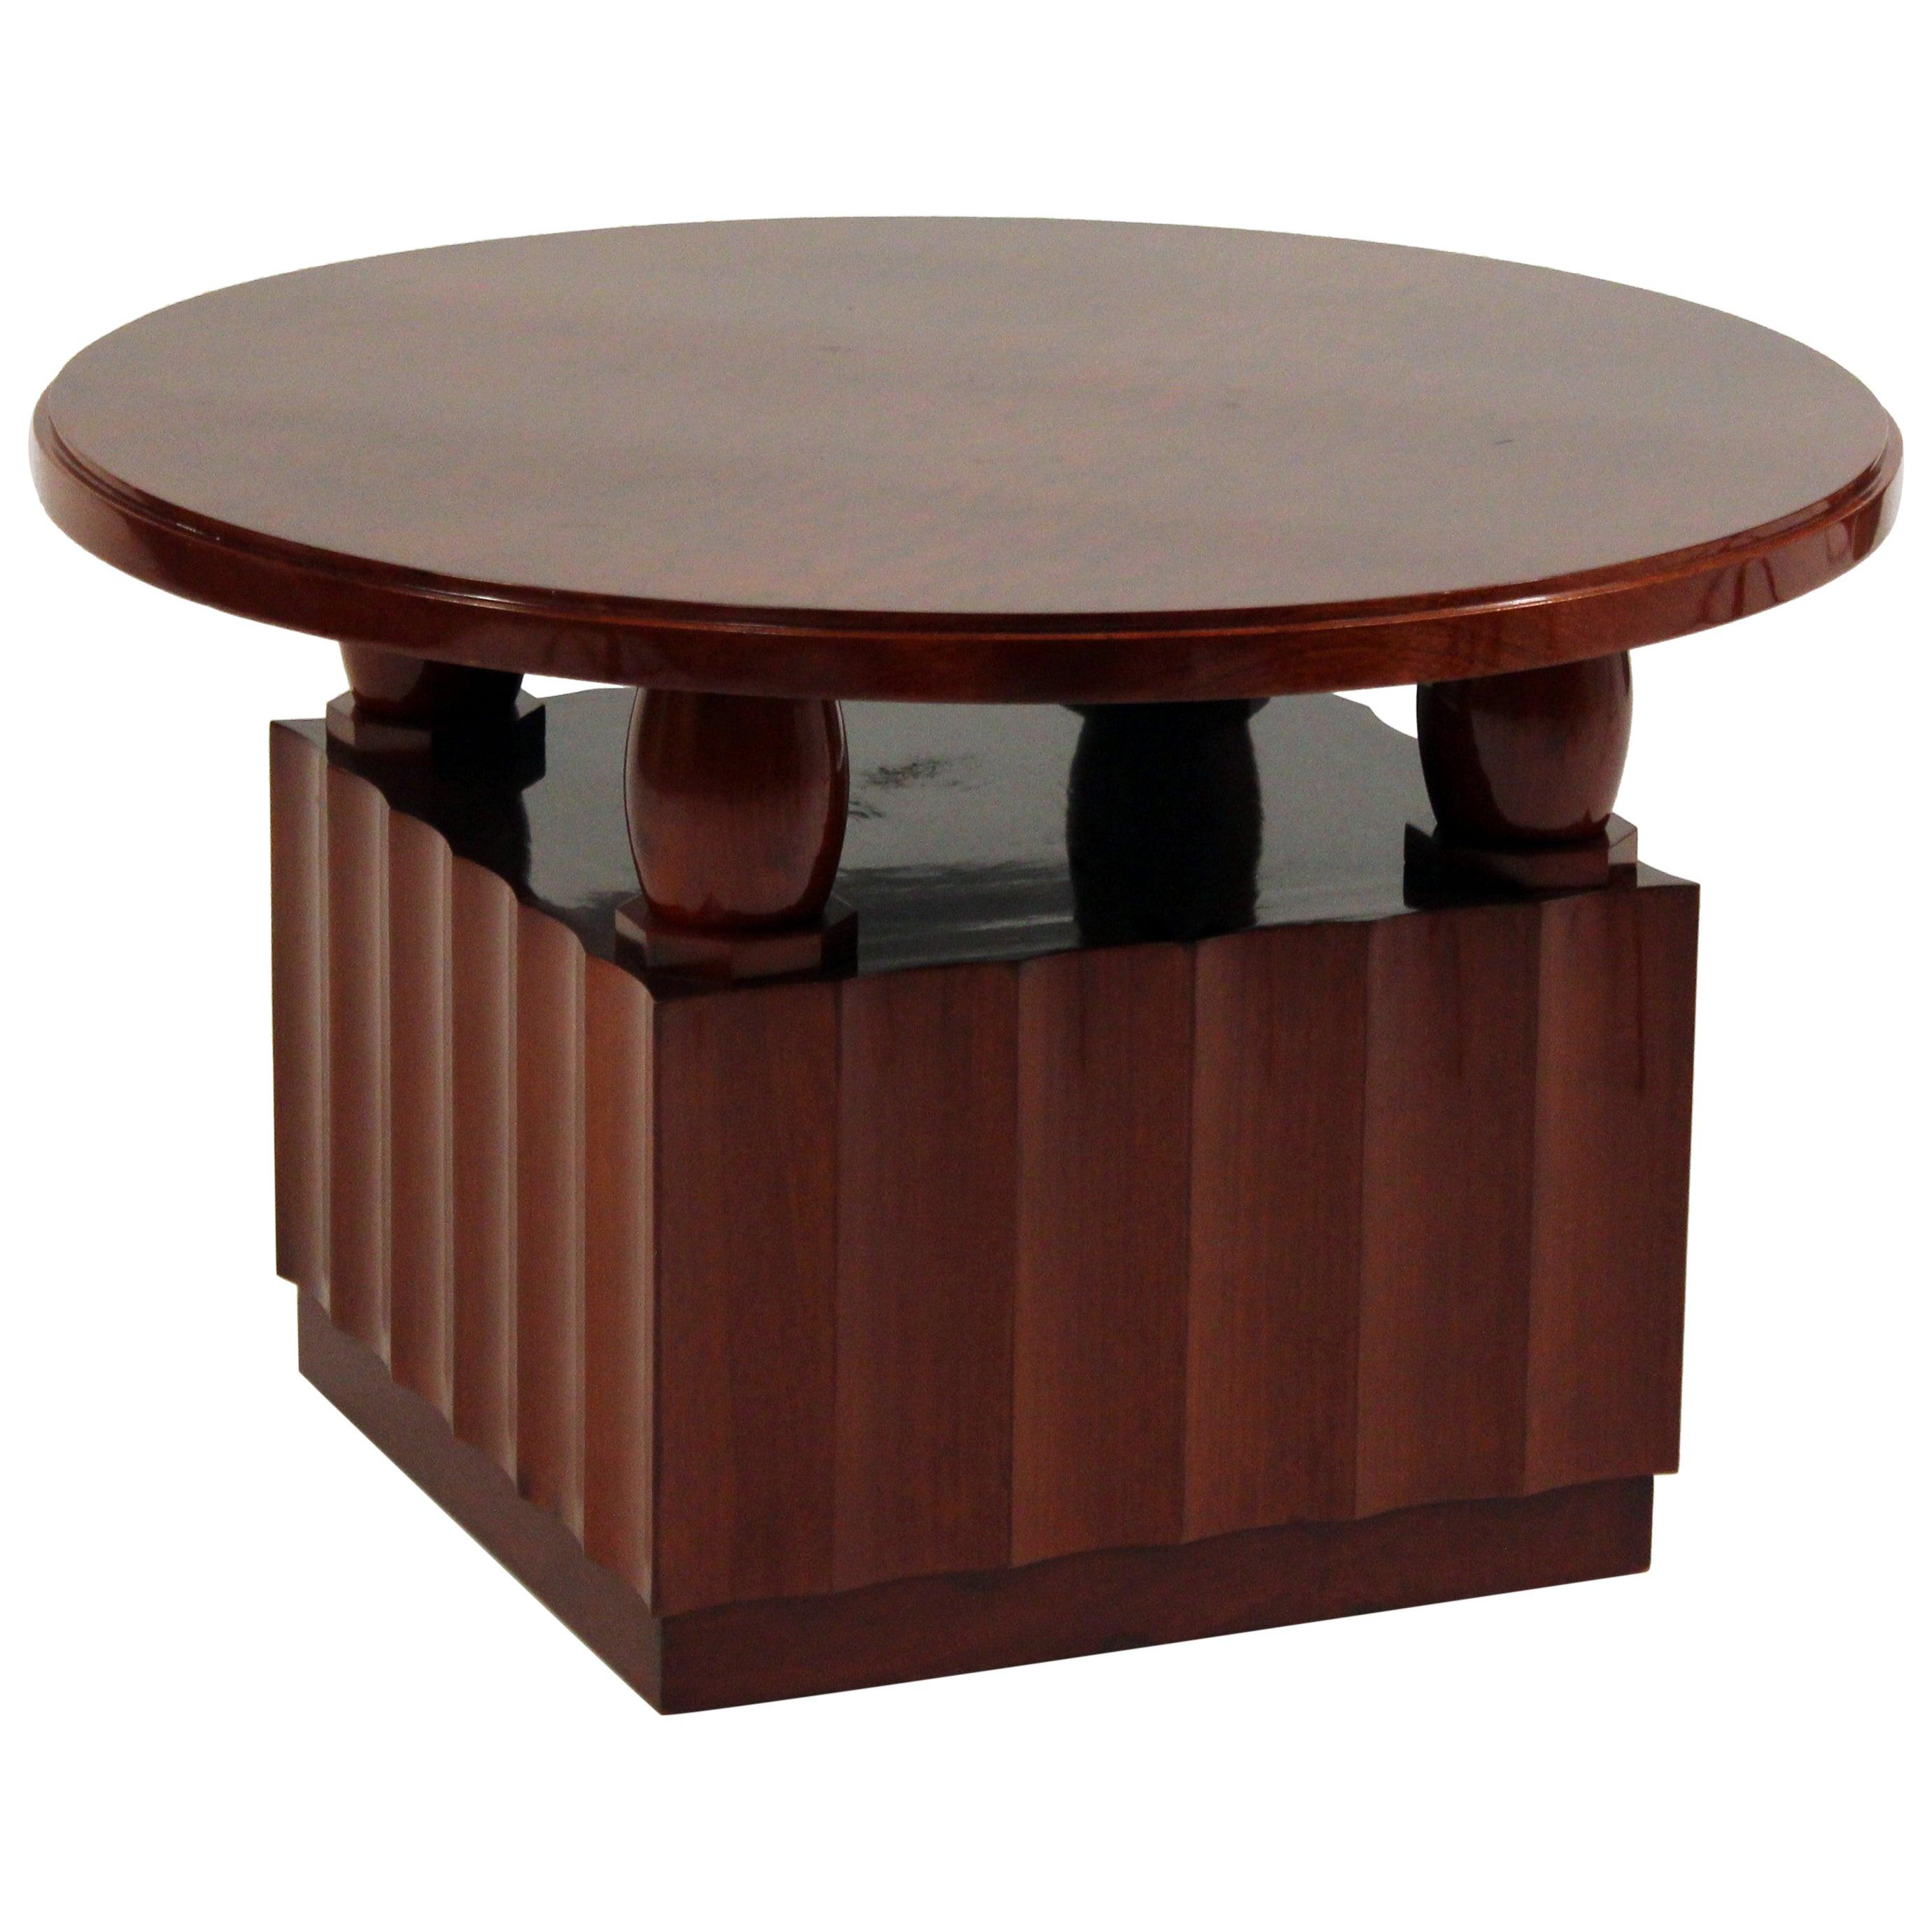 Art Deco Coffee Table by Jules Deroubaix